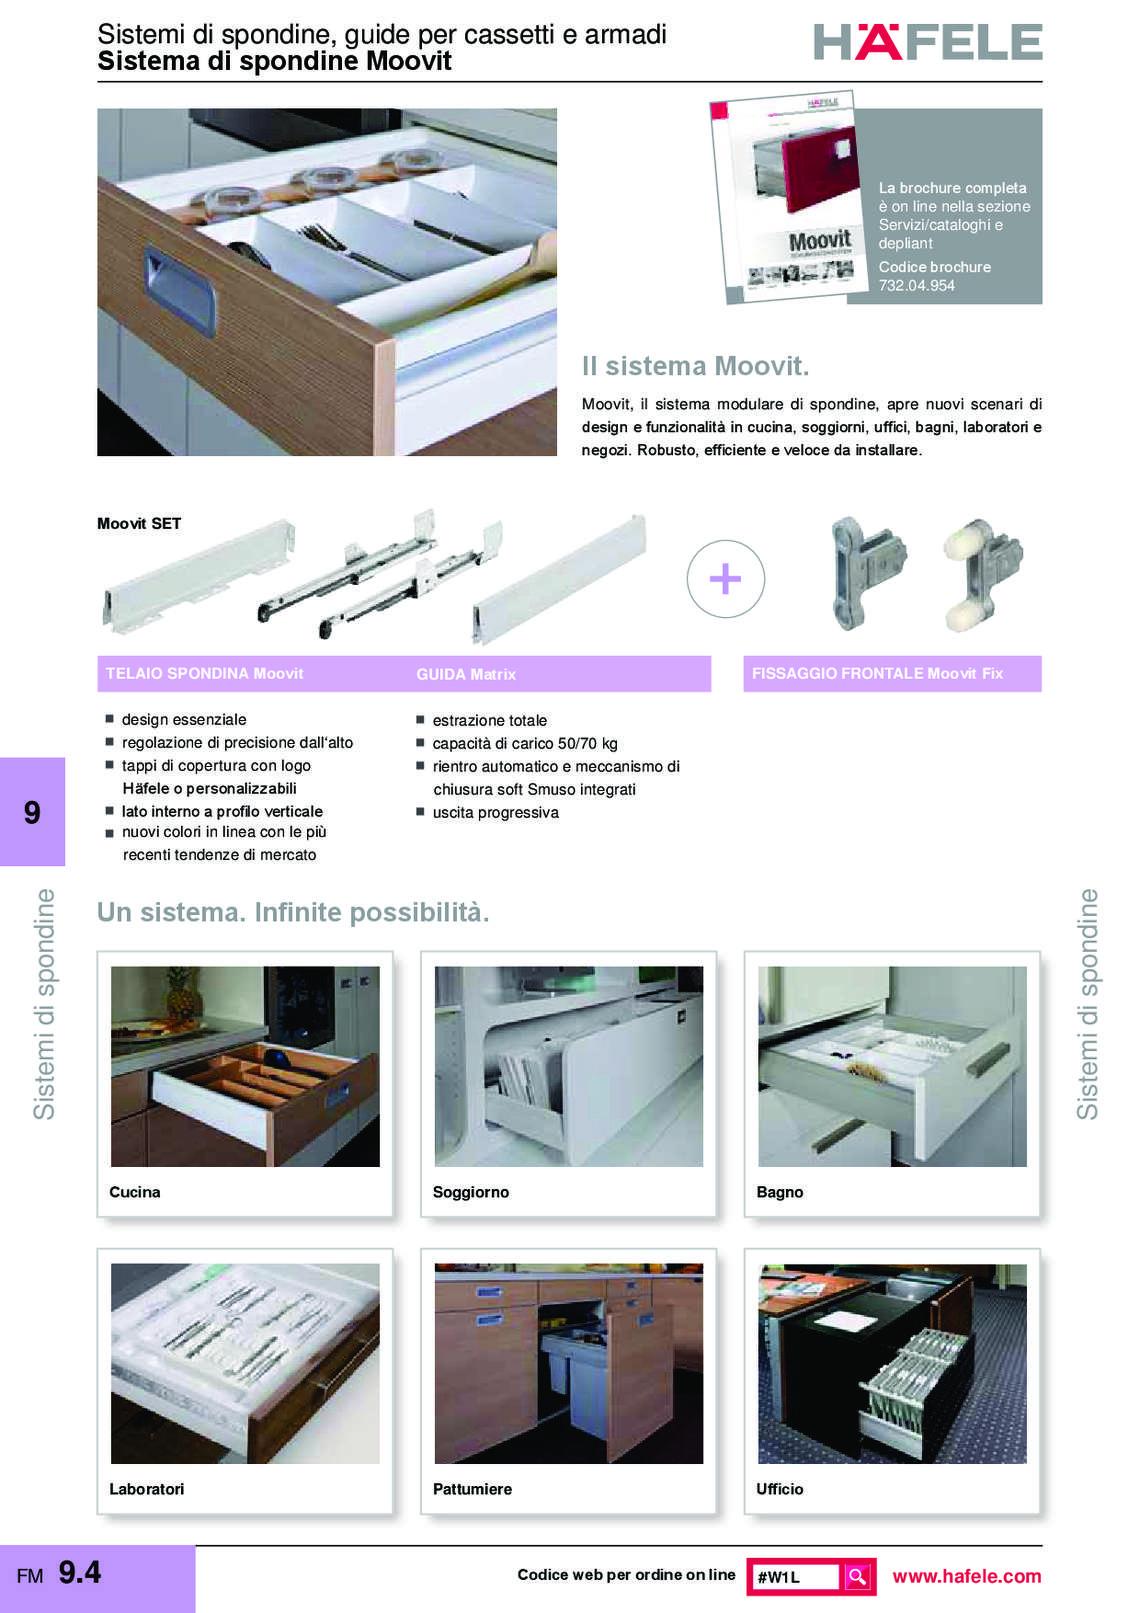 hafele-spondine-e-guide-per-mobili_40_013.jpg